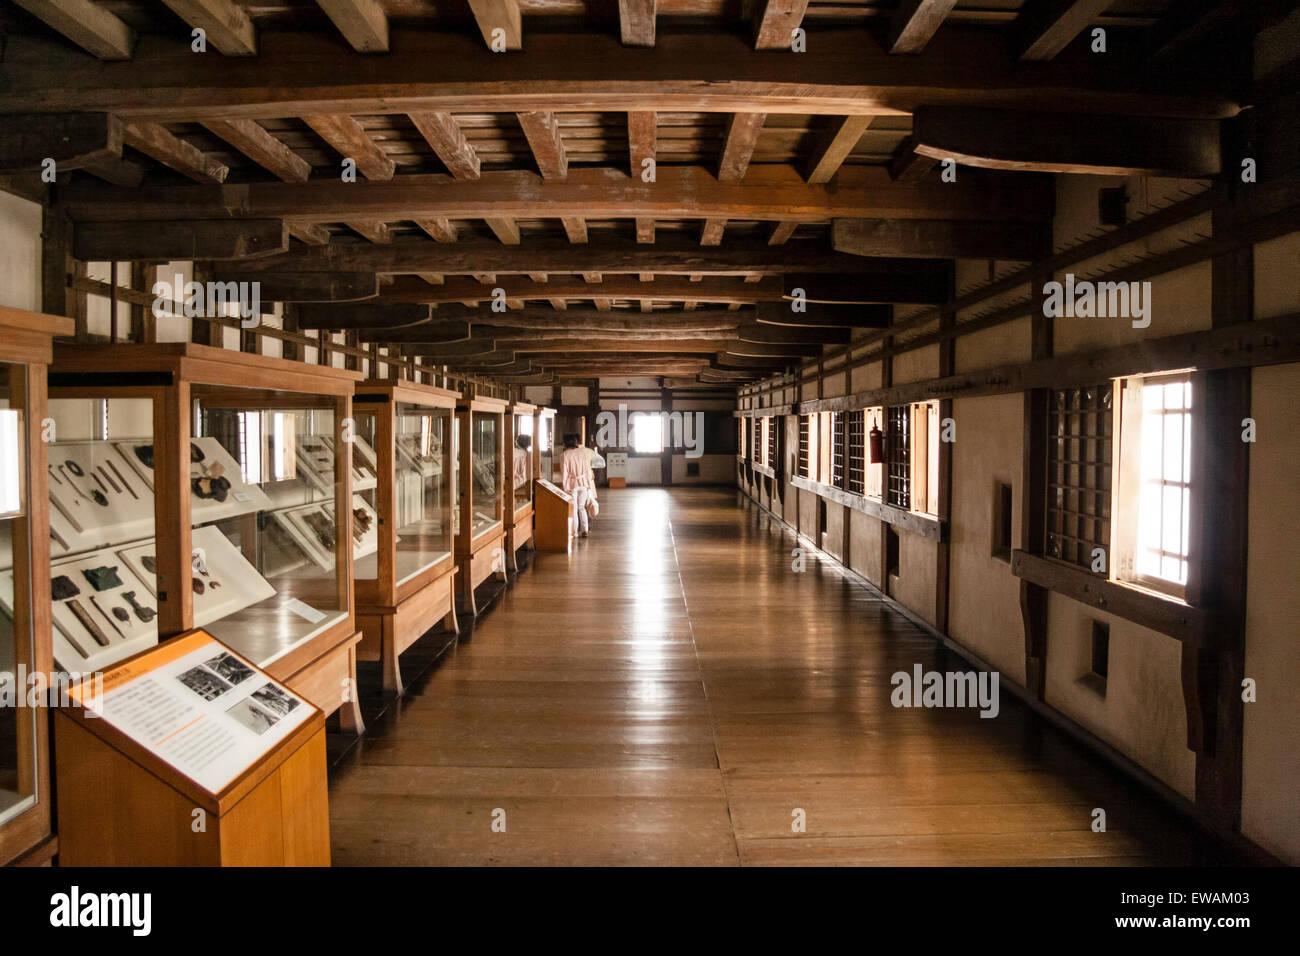 himeji castle, japan. interior of the keep, long open corridor